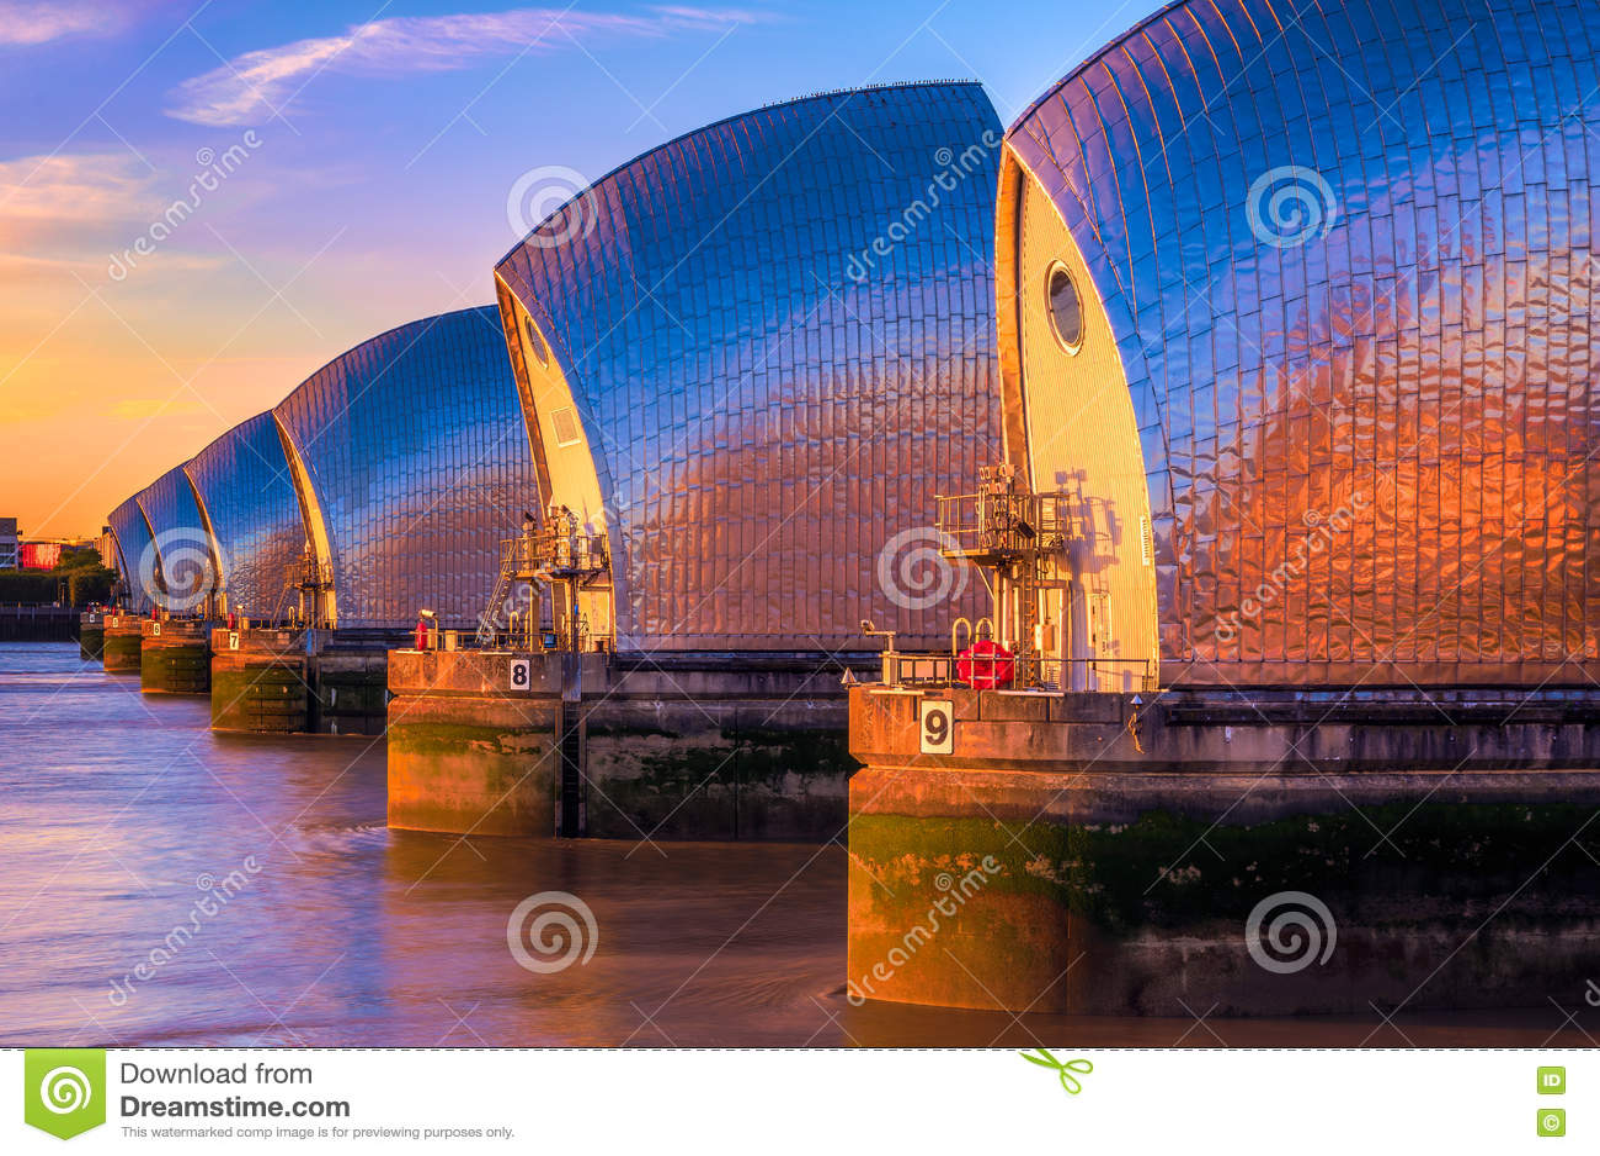 Thames Barrier in London